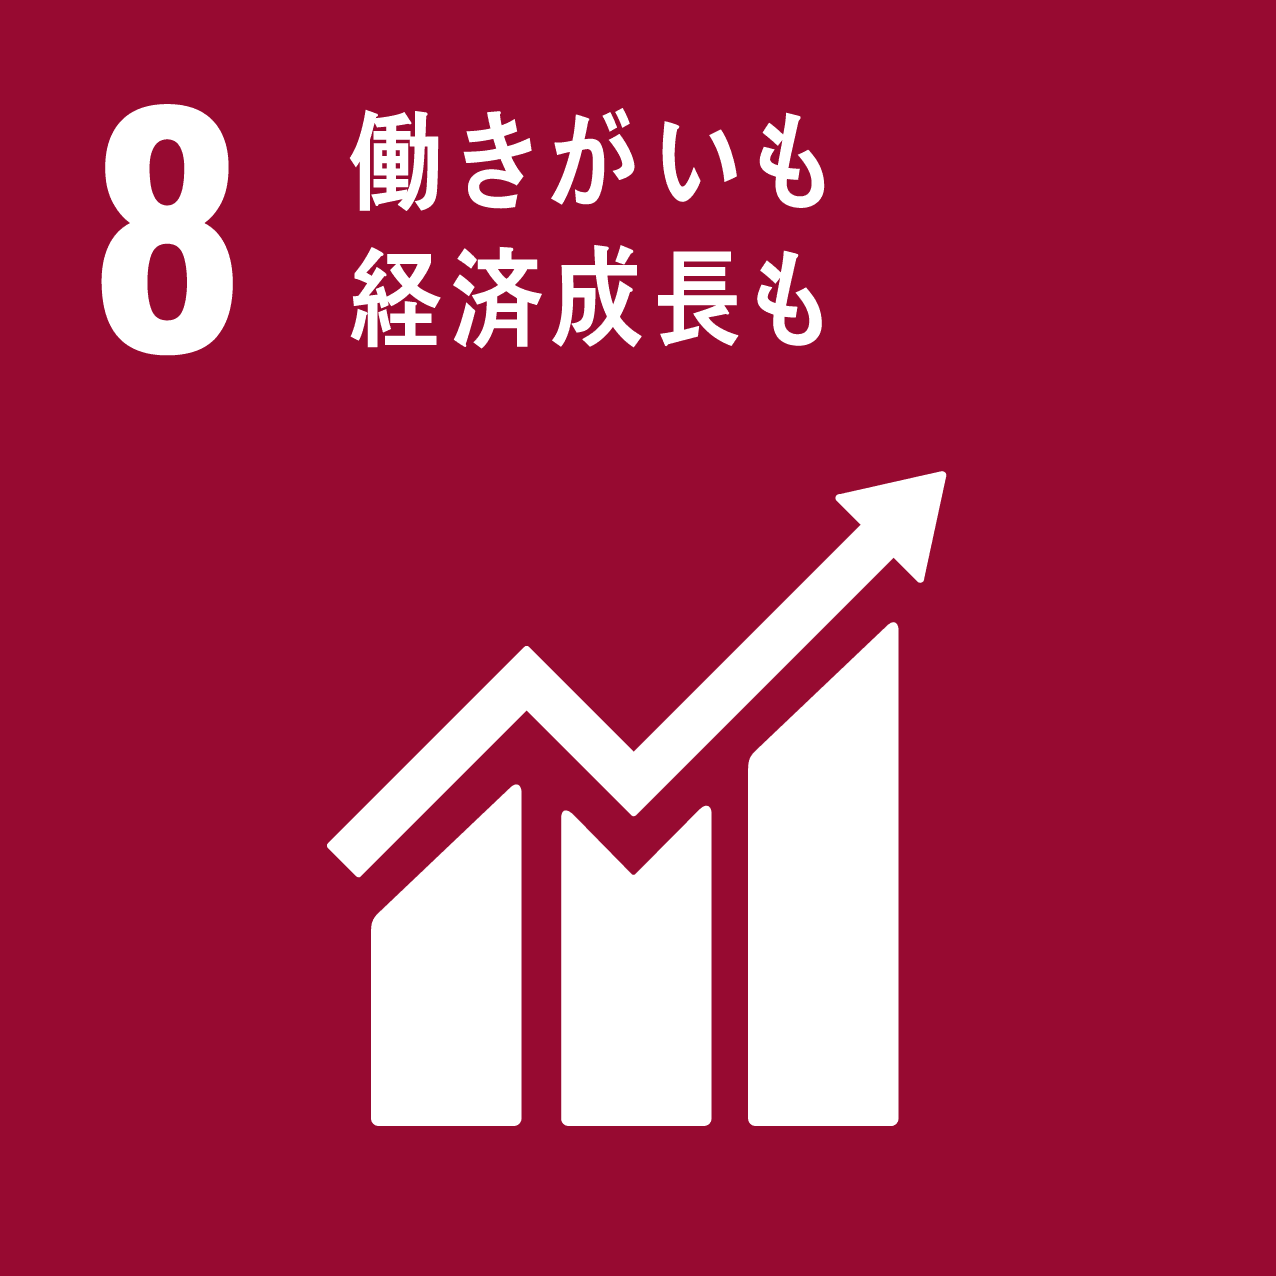 https://okaji.co.jp/files/libs/105/202006151707211860.png